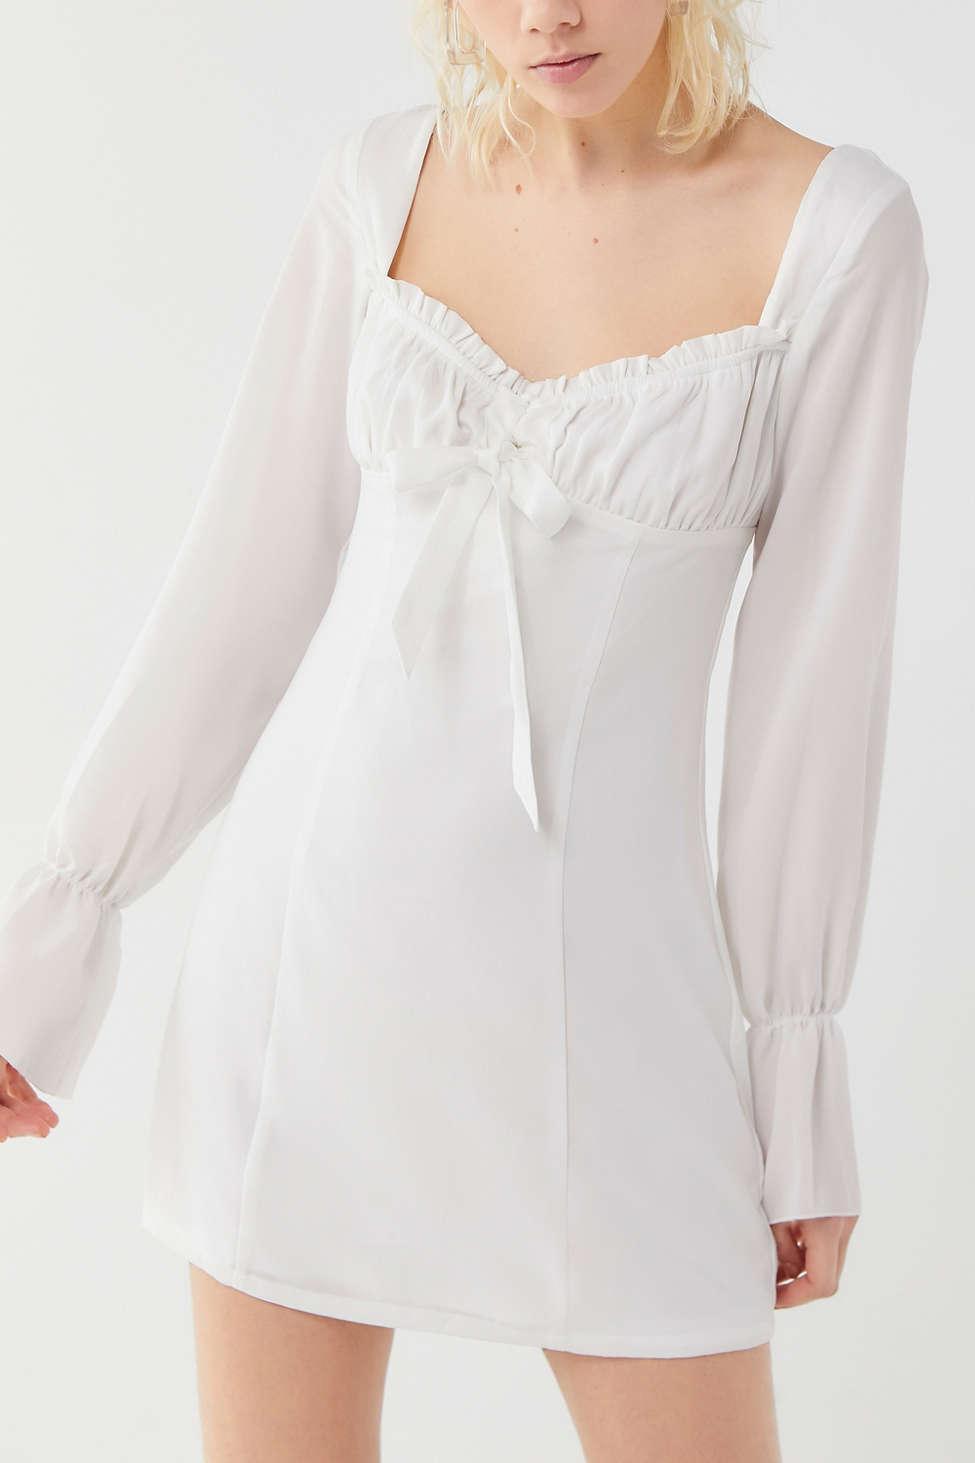 cede176b25565 Tiger Mist Orchard Empire Waist Mini Dress in White - Lyst